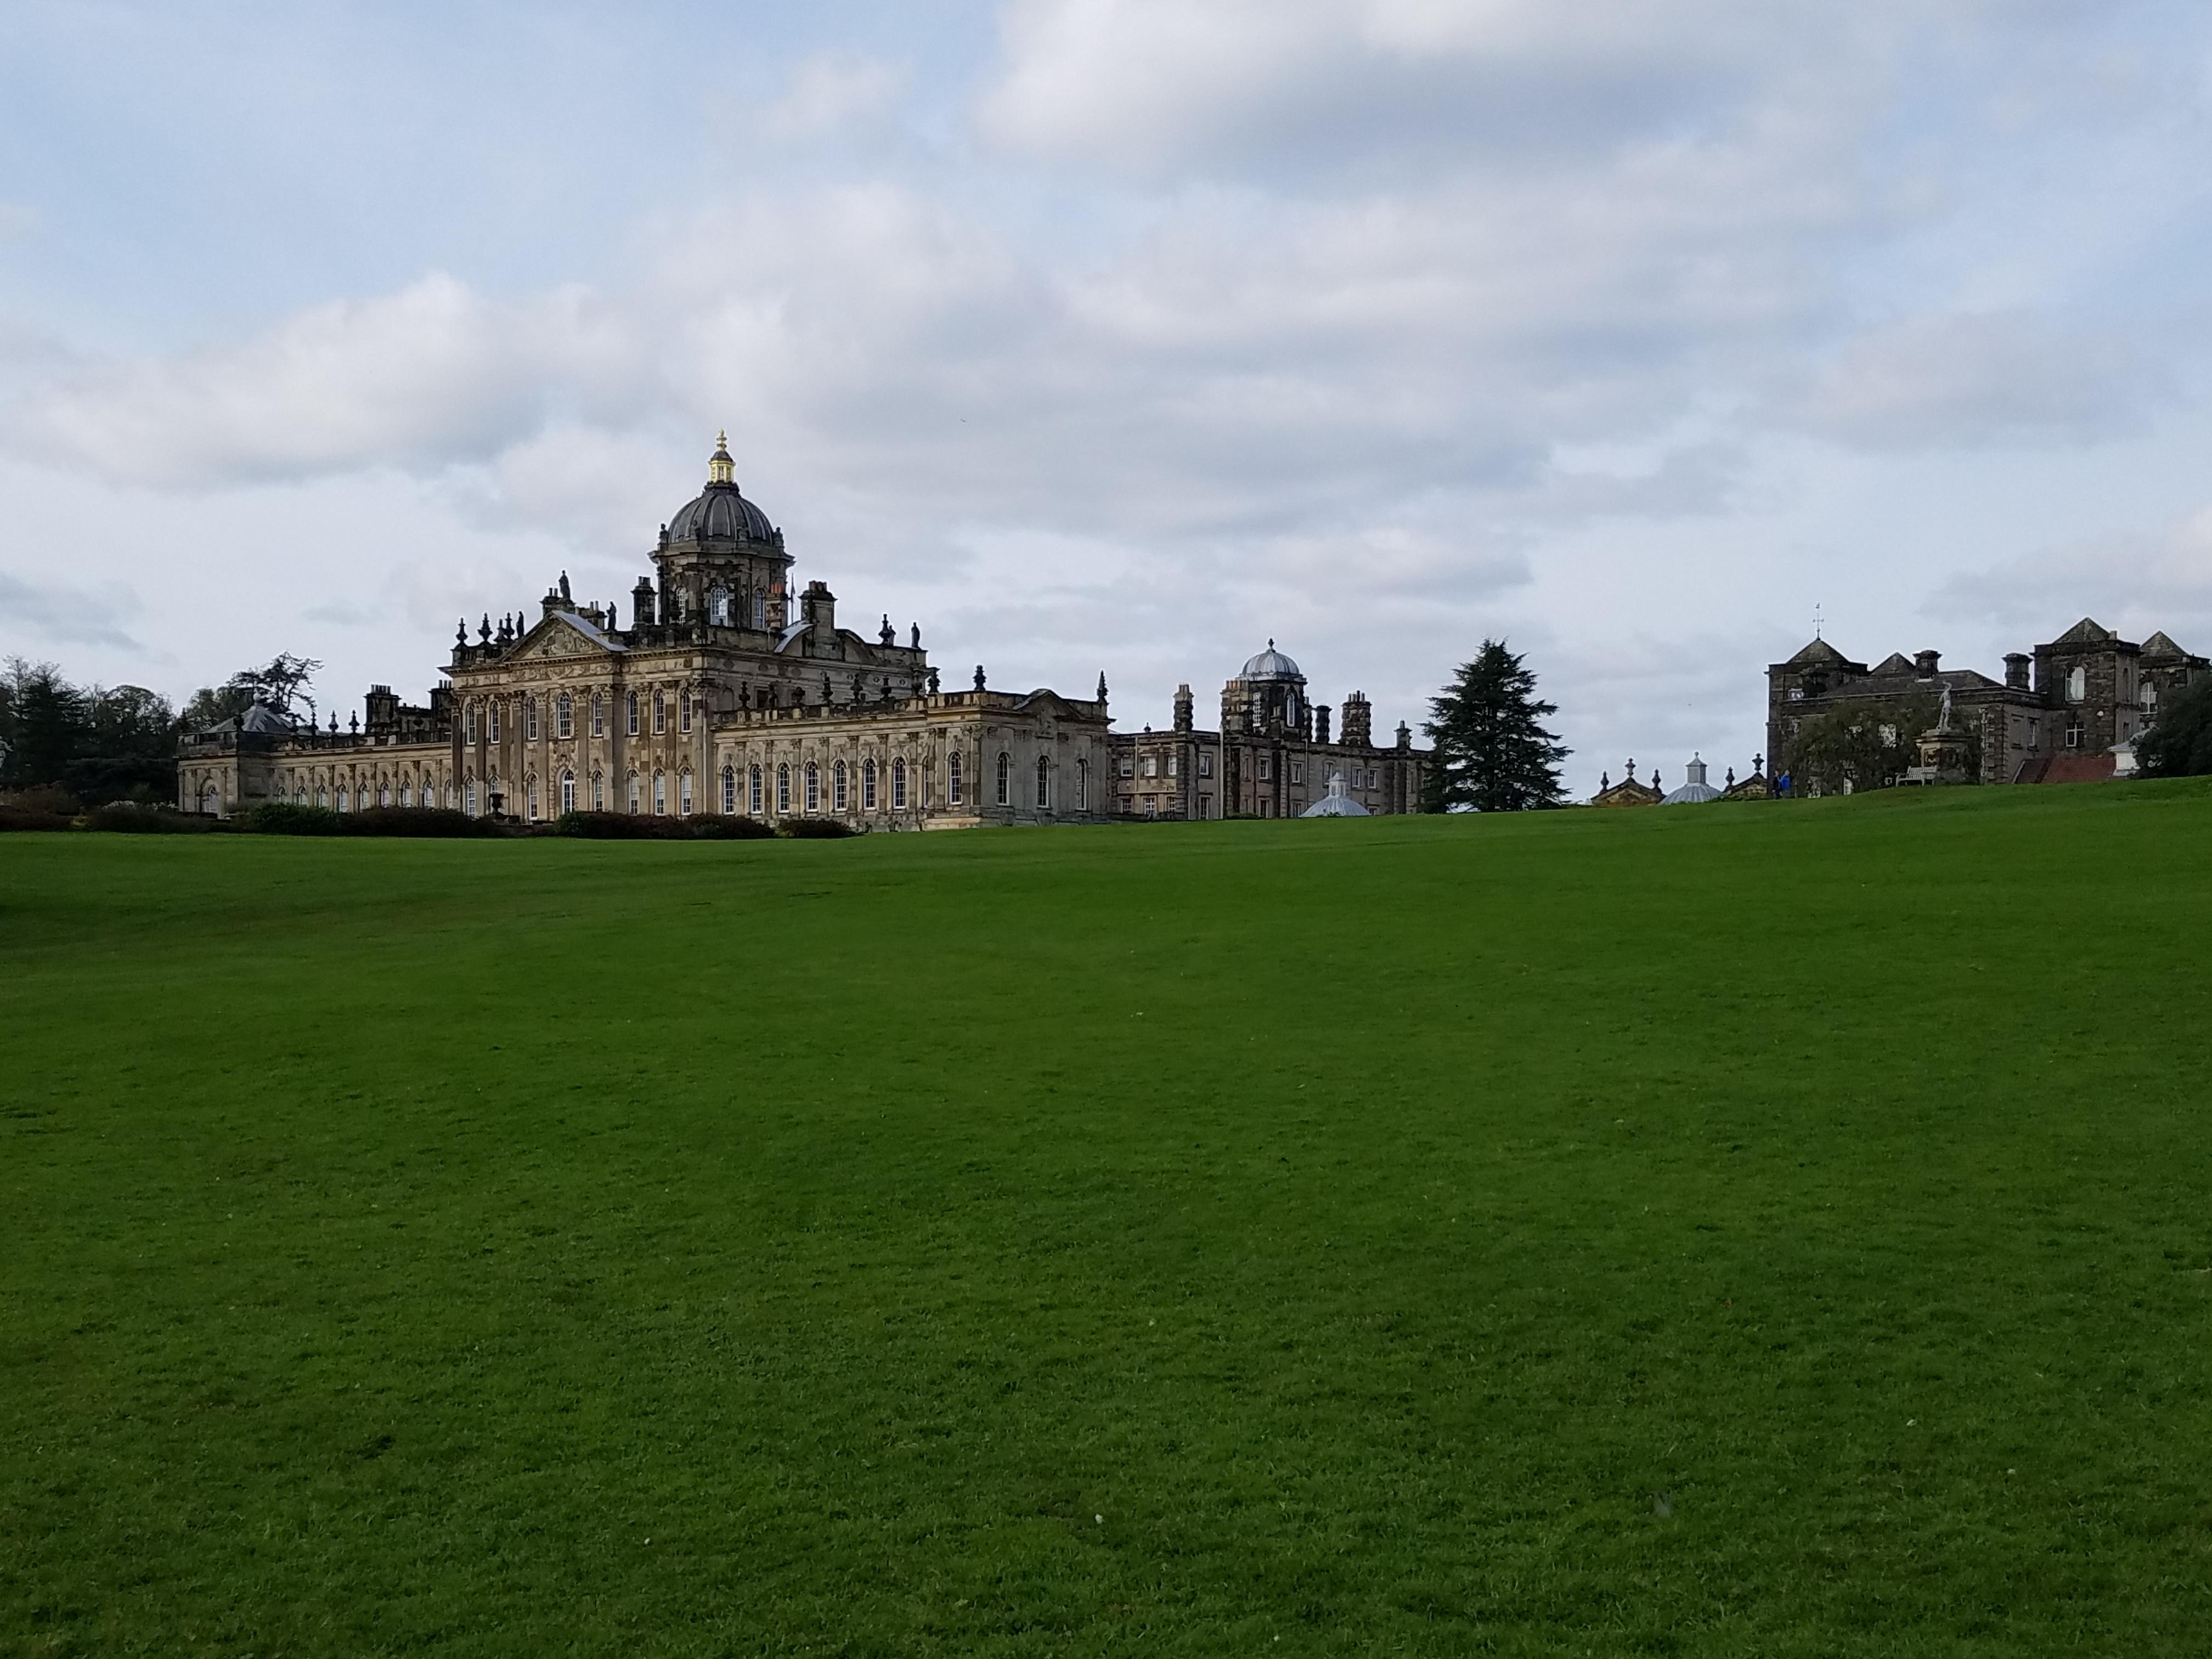 Yorkshire – Castle Howard